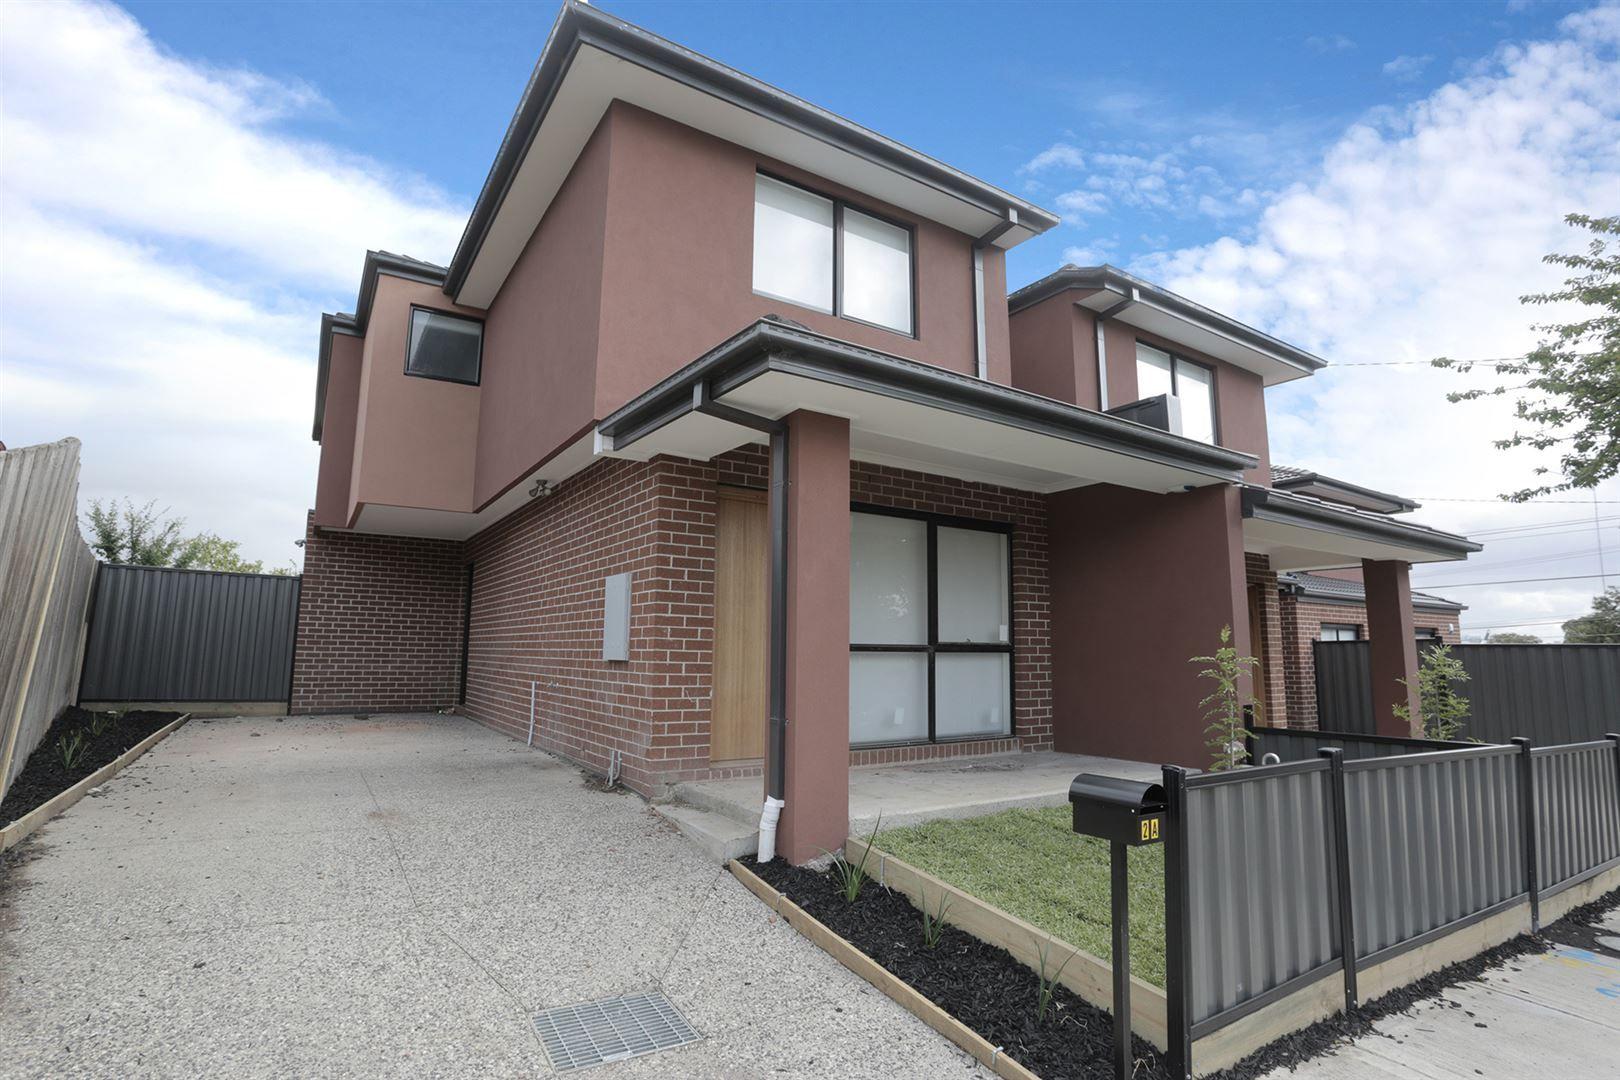 2A Bushfield Crescent, Coolaroo VIC 3048, Image 0